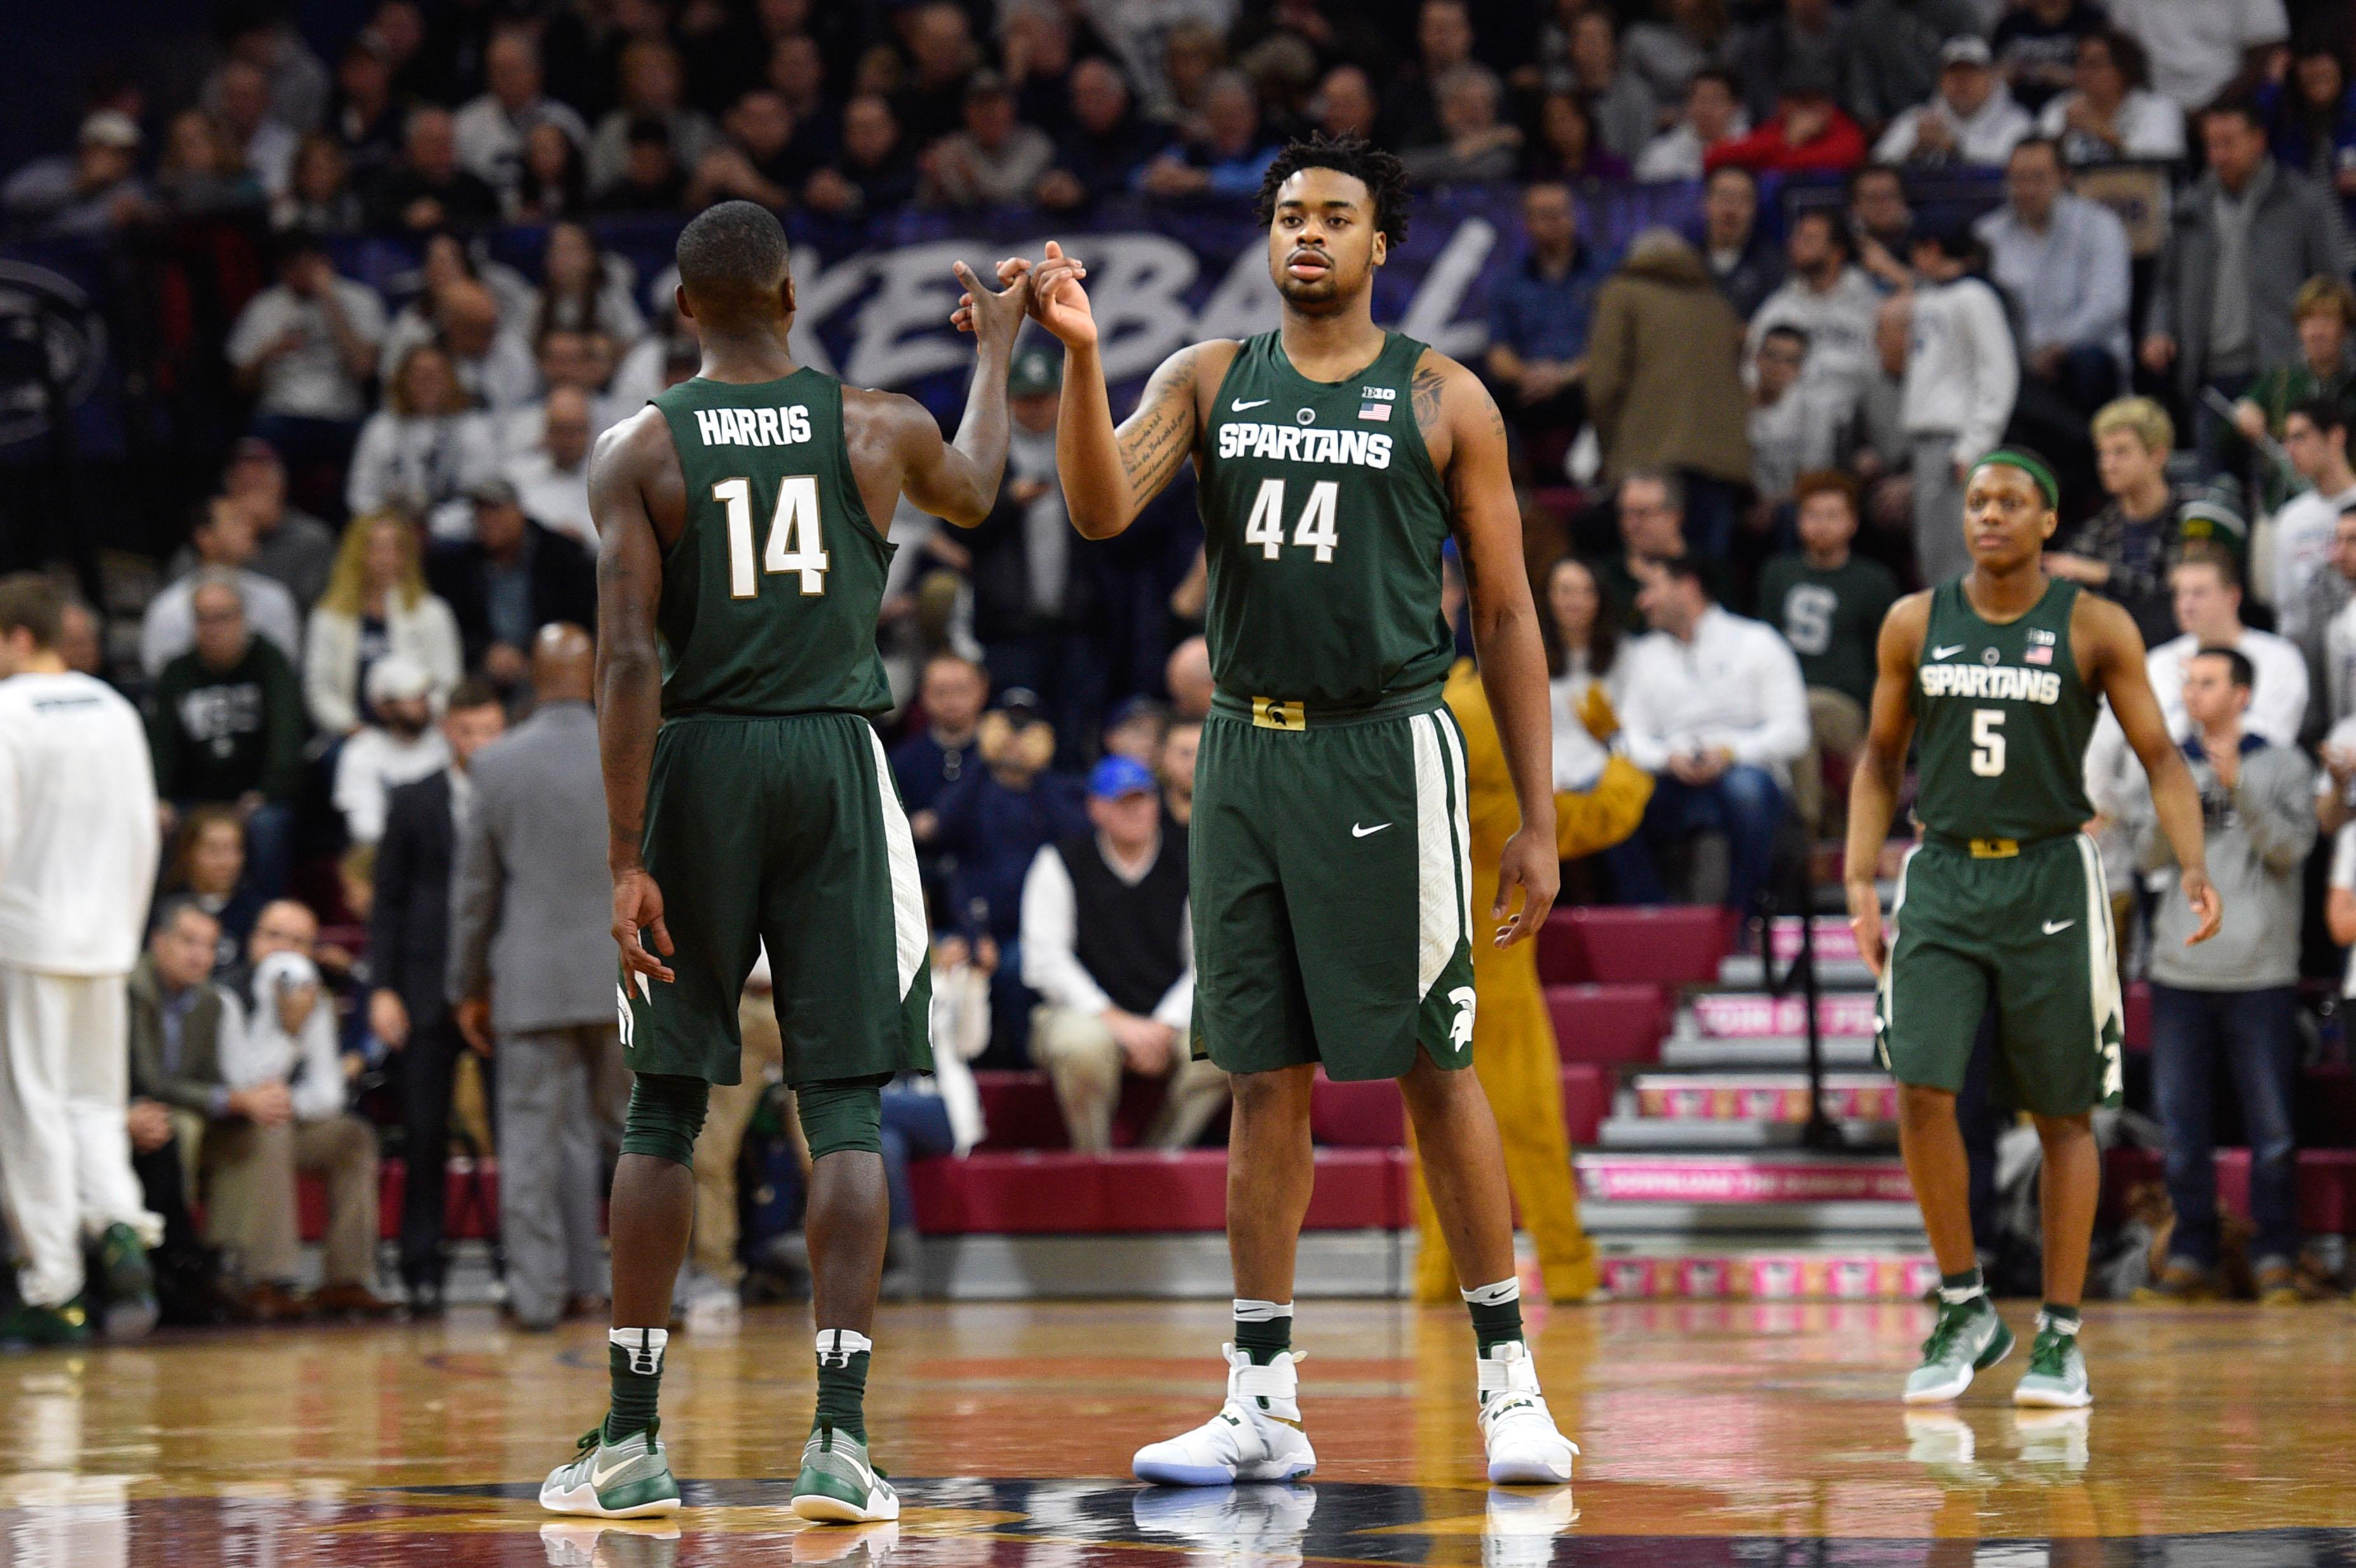 Michigan State Basketball: 5 bold predictions vs. Michigan